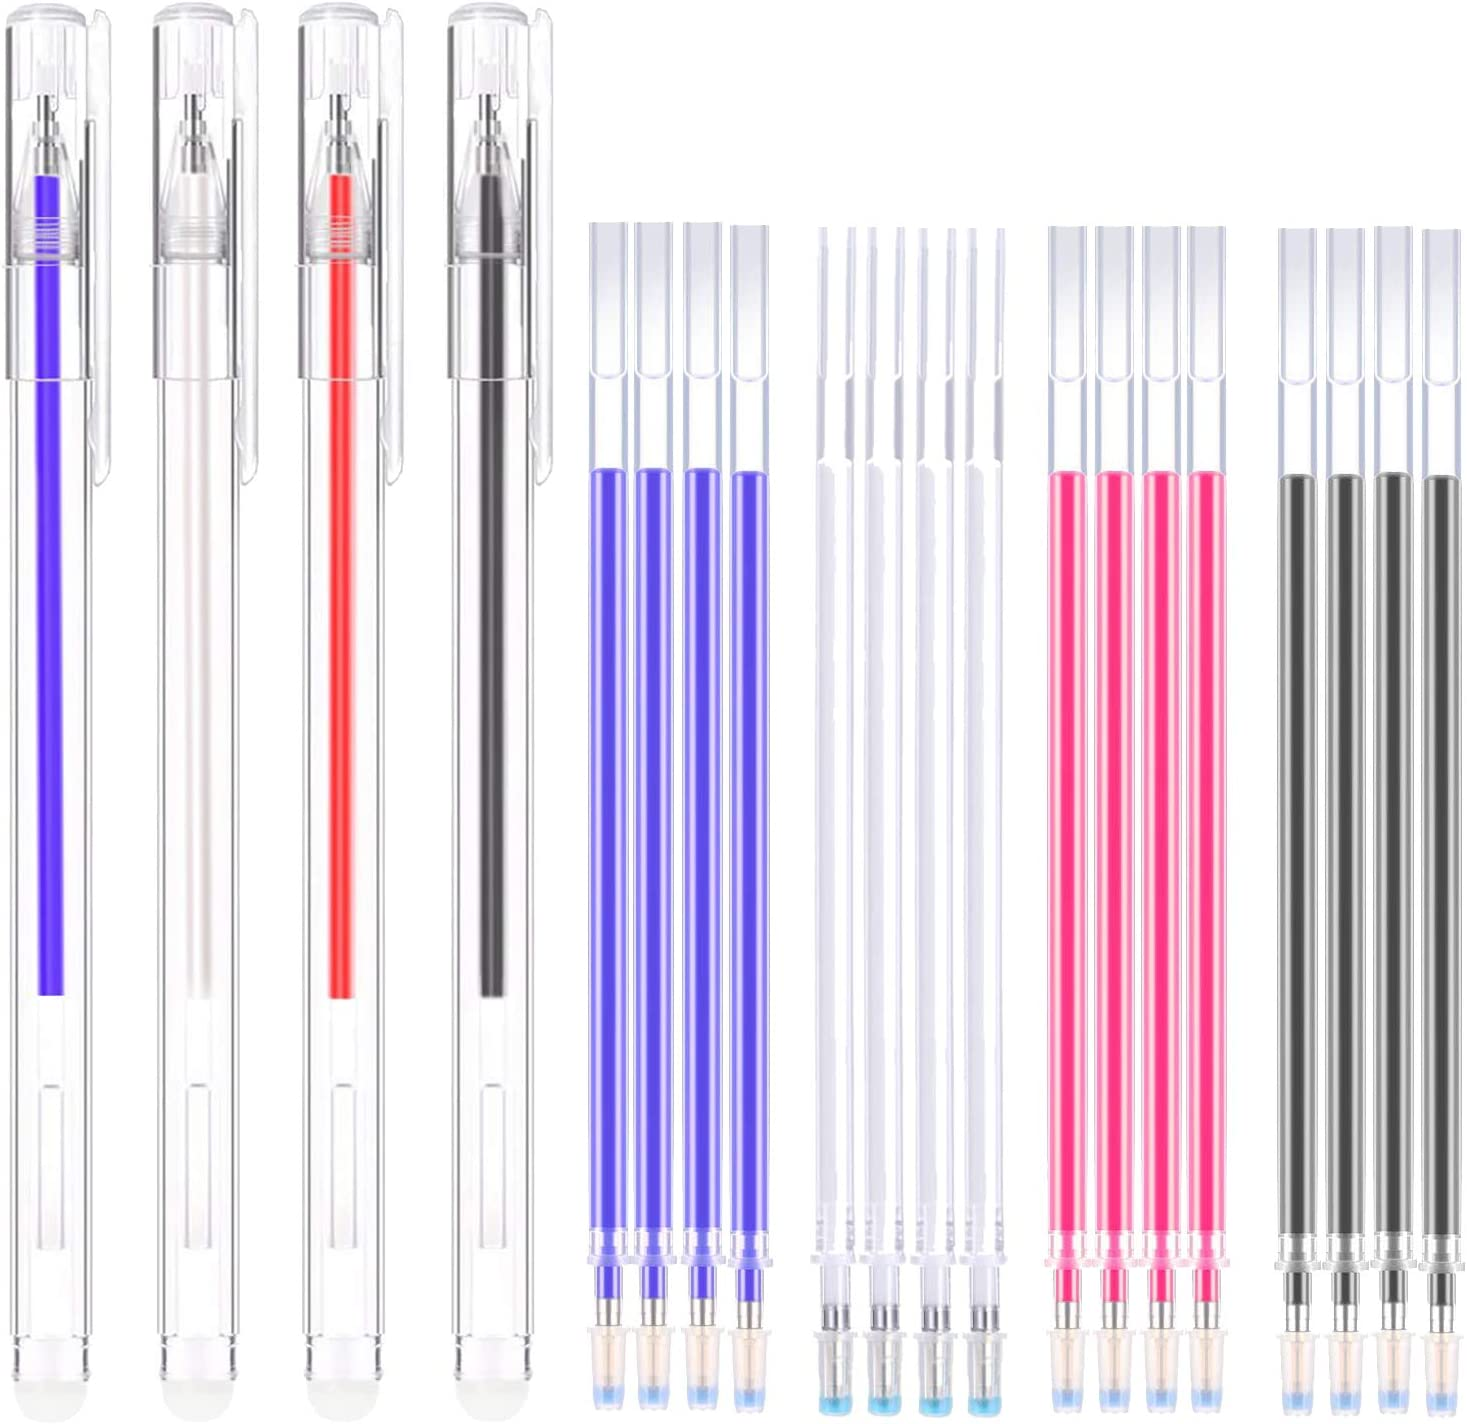 Bolígrafo Borrable de Calor Rotulador Borrable de Tela con para Sastre Costura, y Acolchado, 4 Colores de Marcadores Borrables para Telas de Colores Variados (20)